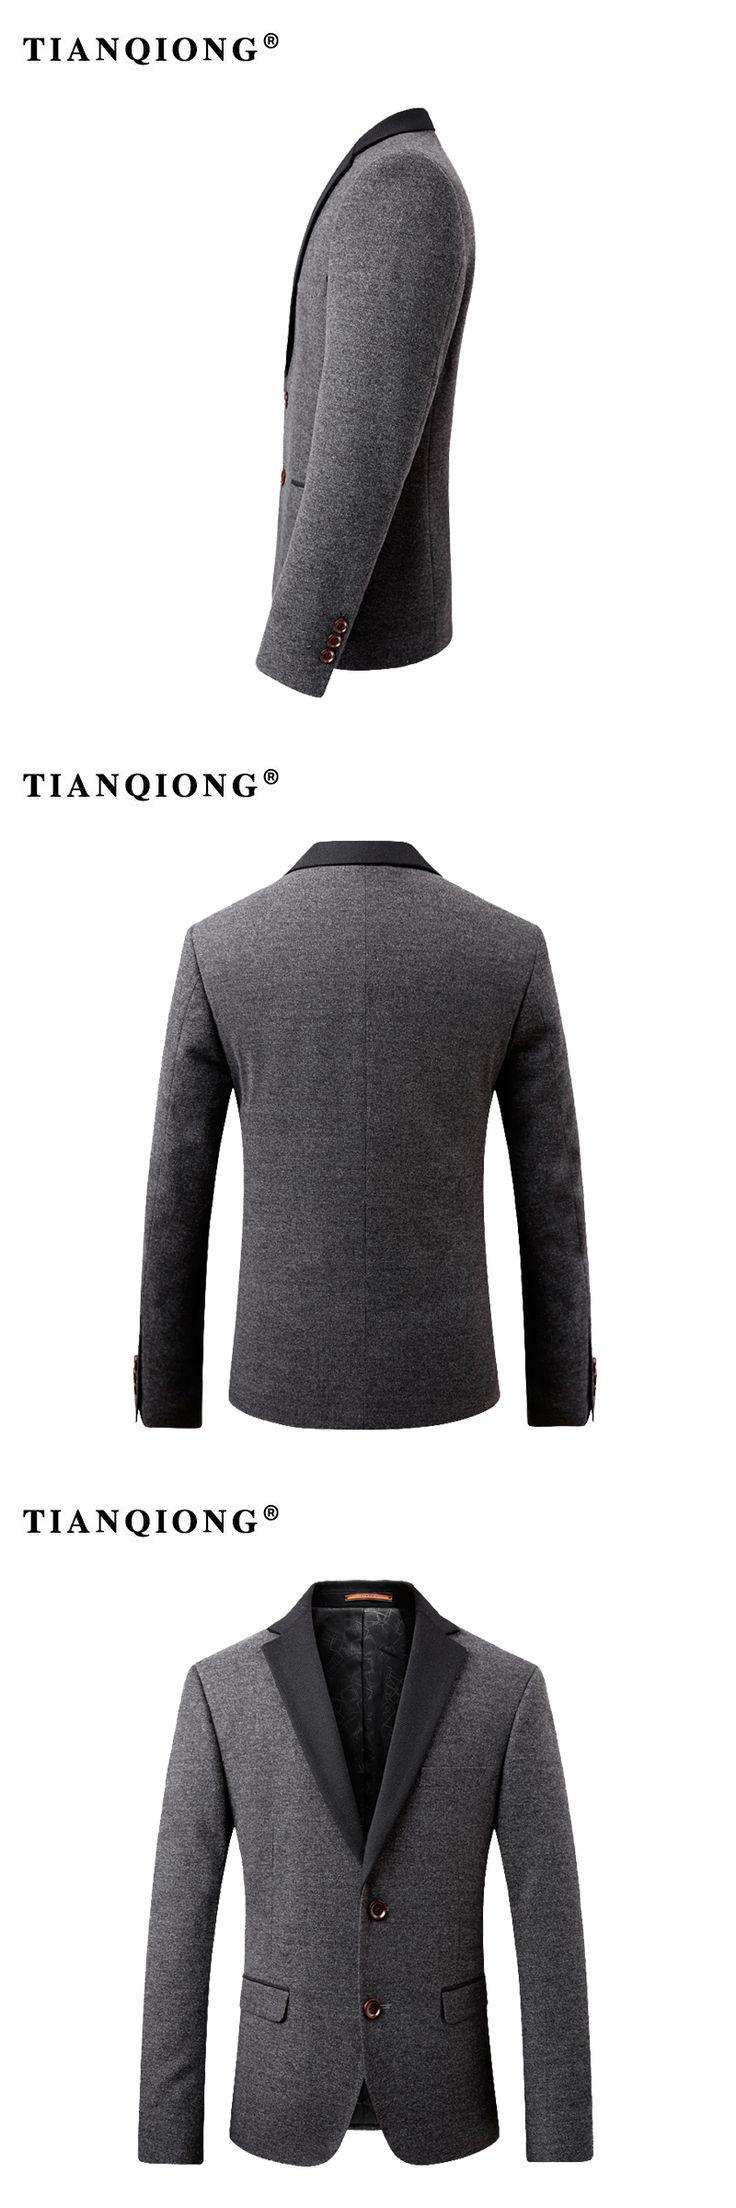 TIAN QIONG 2018 Brand Men Casual Cotton Blazer for Autumn Winter Men's Cotton Suit Jacket Male Slim Fit Jaqueta Blazer Masculino